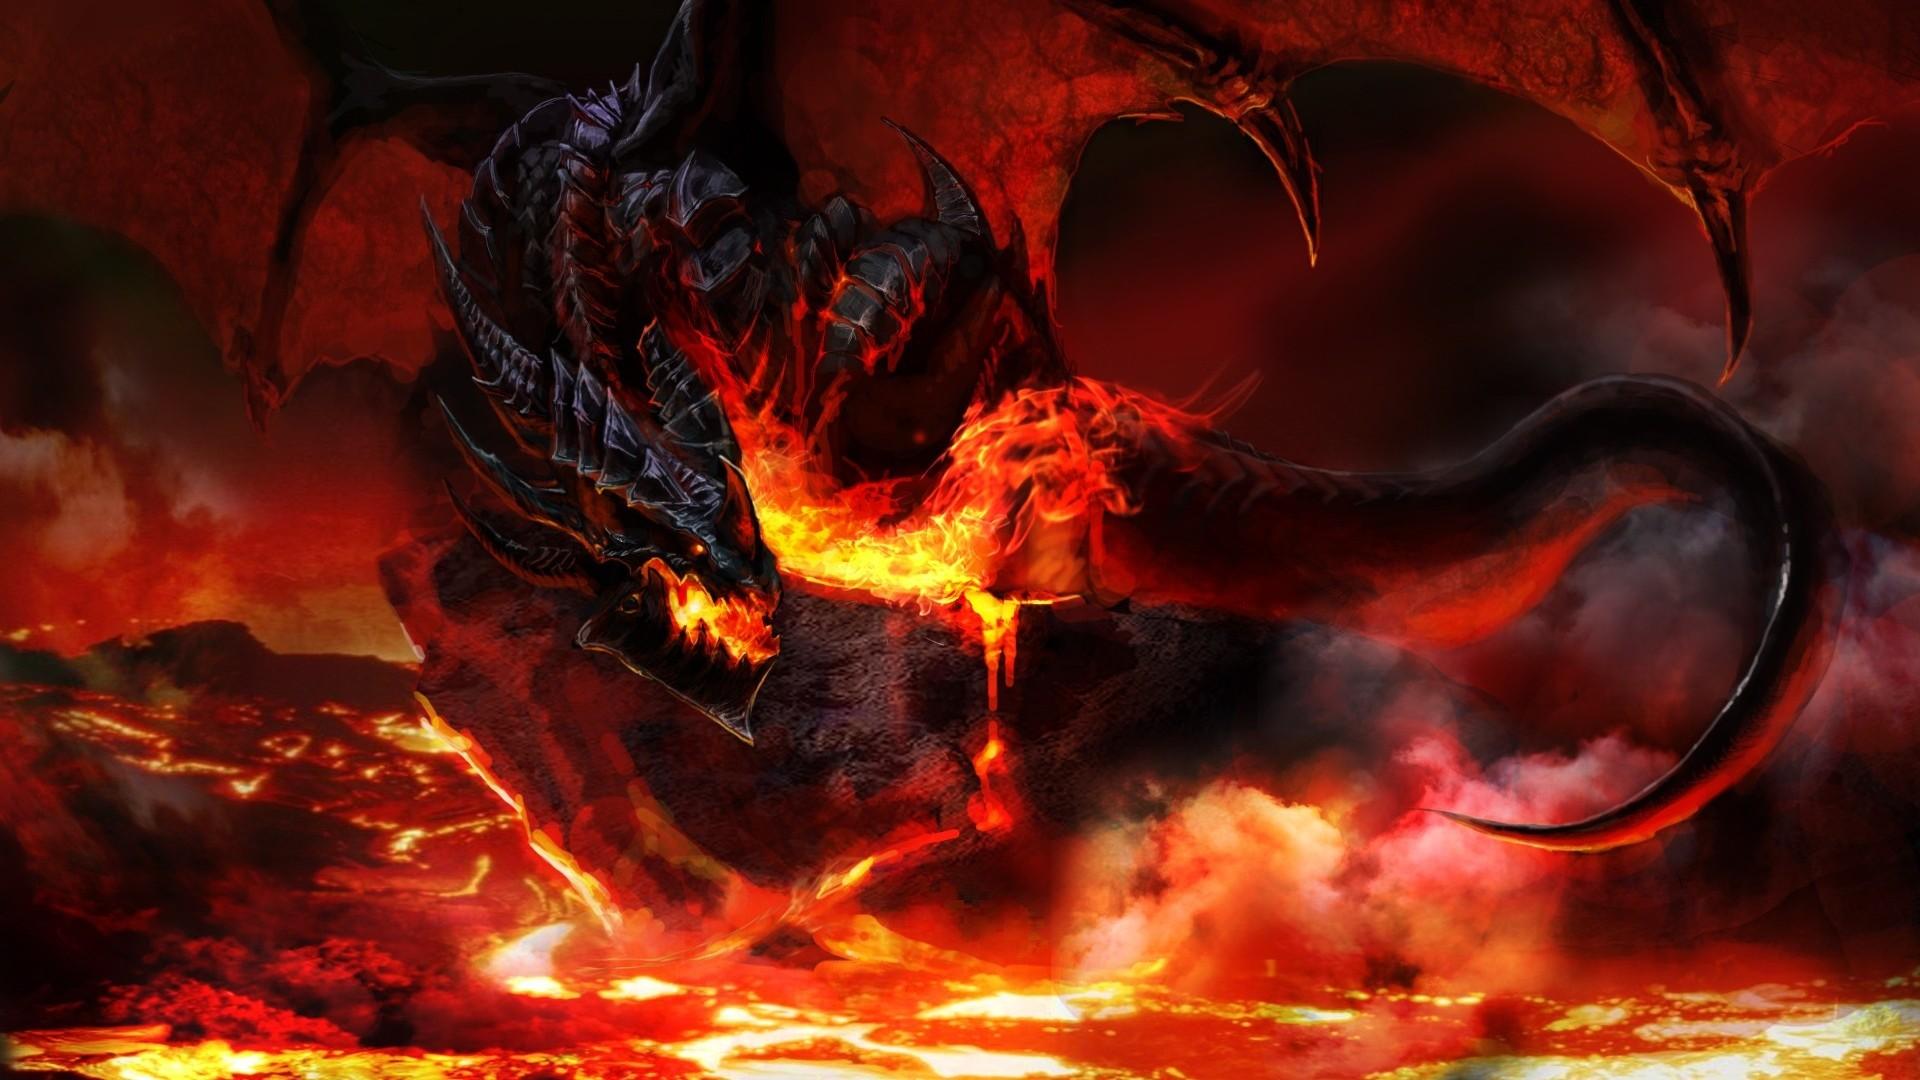 Dragon Wallpaper 1080p Wallpapertag